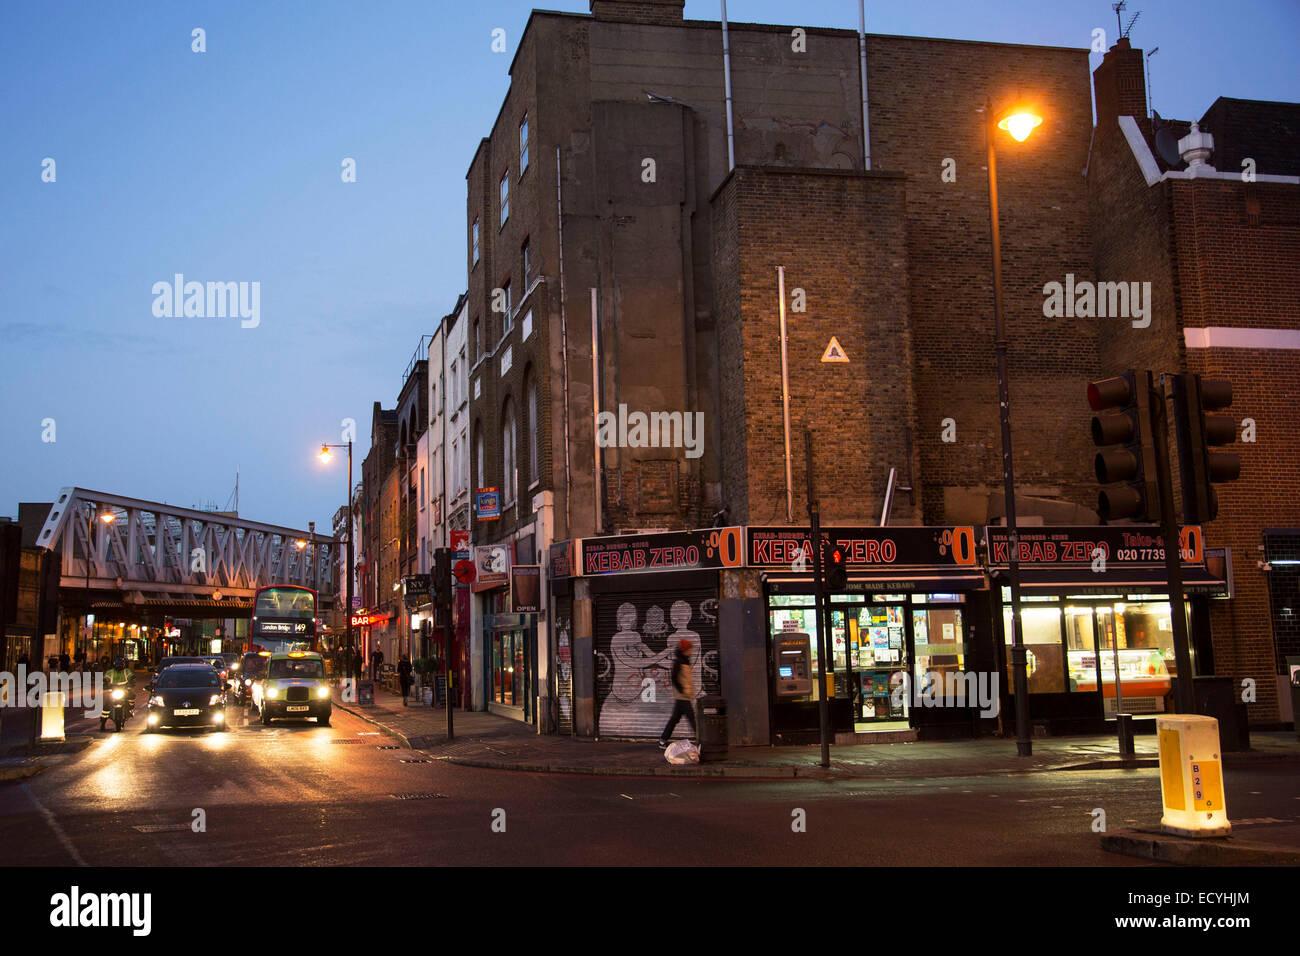 Kebab shop fast food restaurant on City Road in East London, UK. - Stock Image